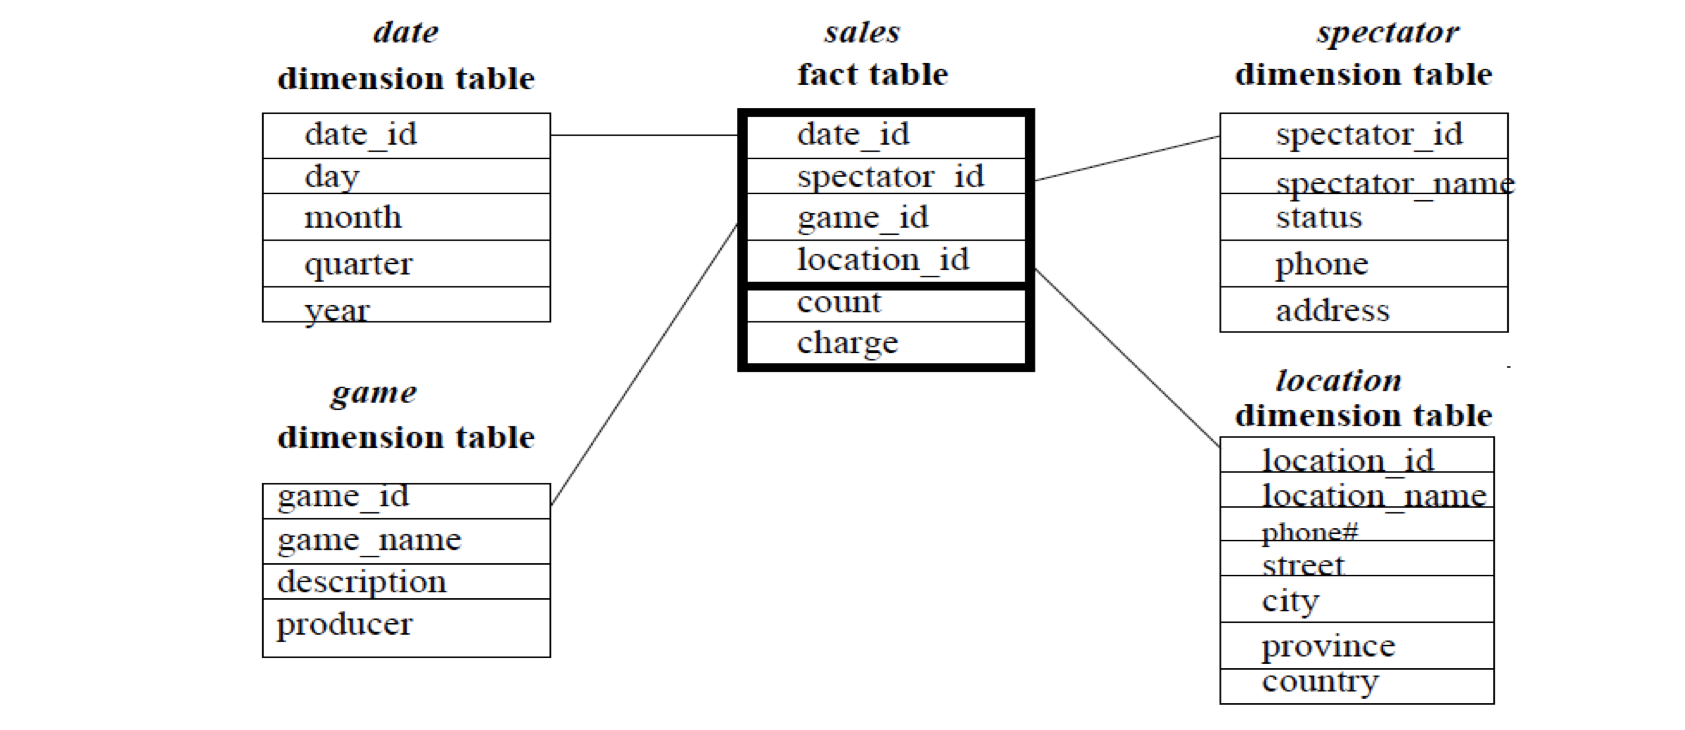 DOCUMENTATION · jlroo/data-mining Wiki · GitHub